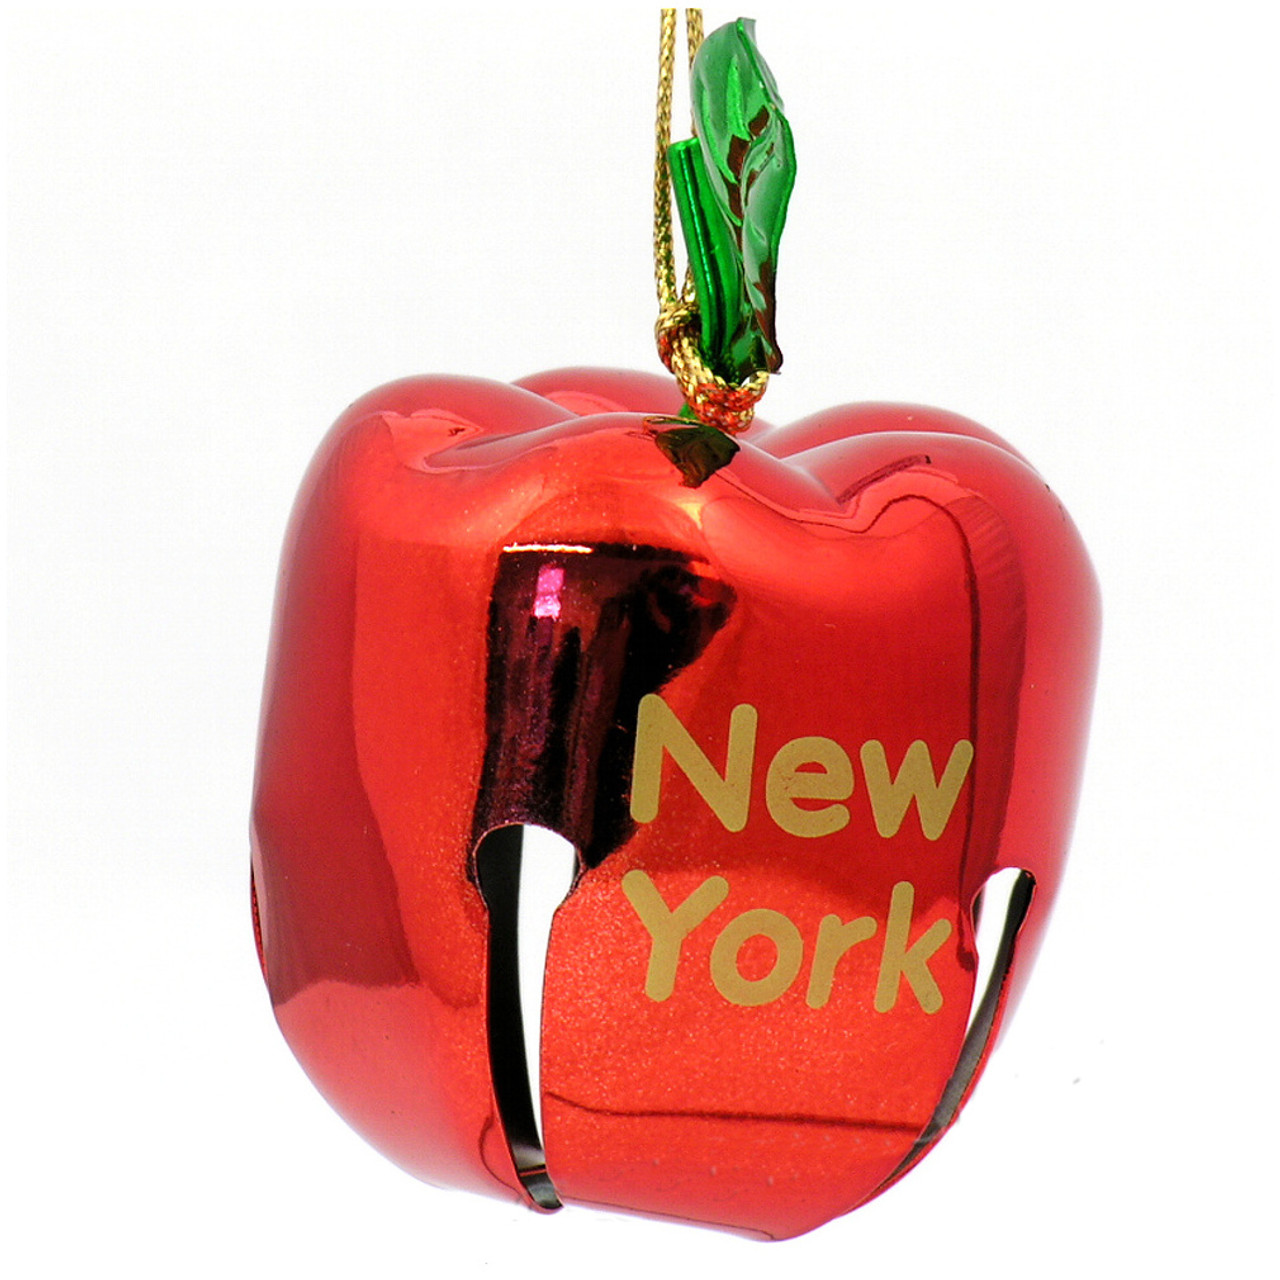 New York Apple Bell Ornament